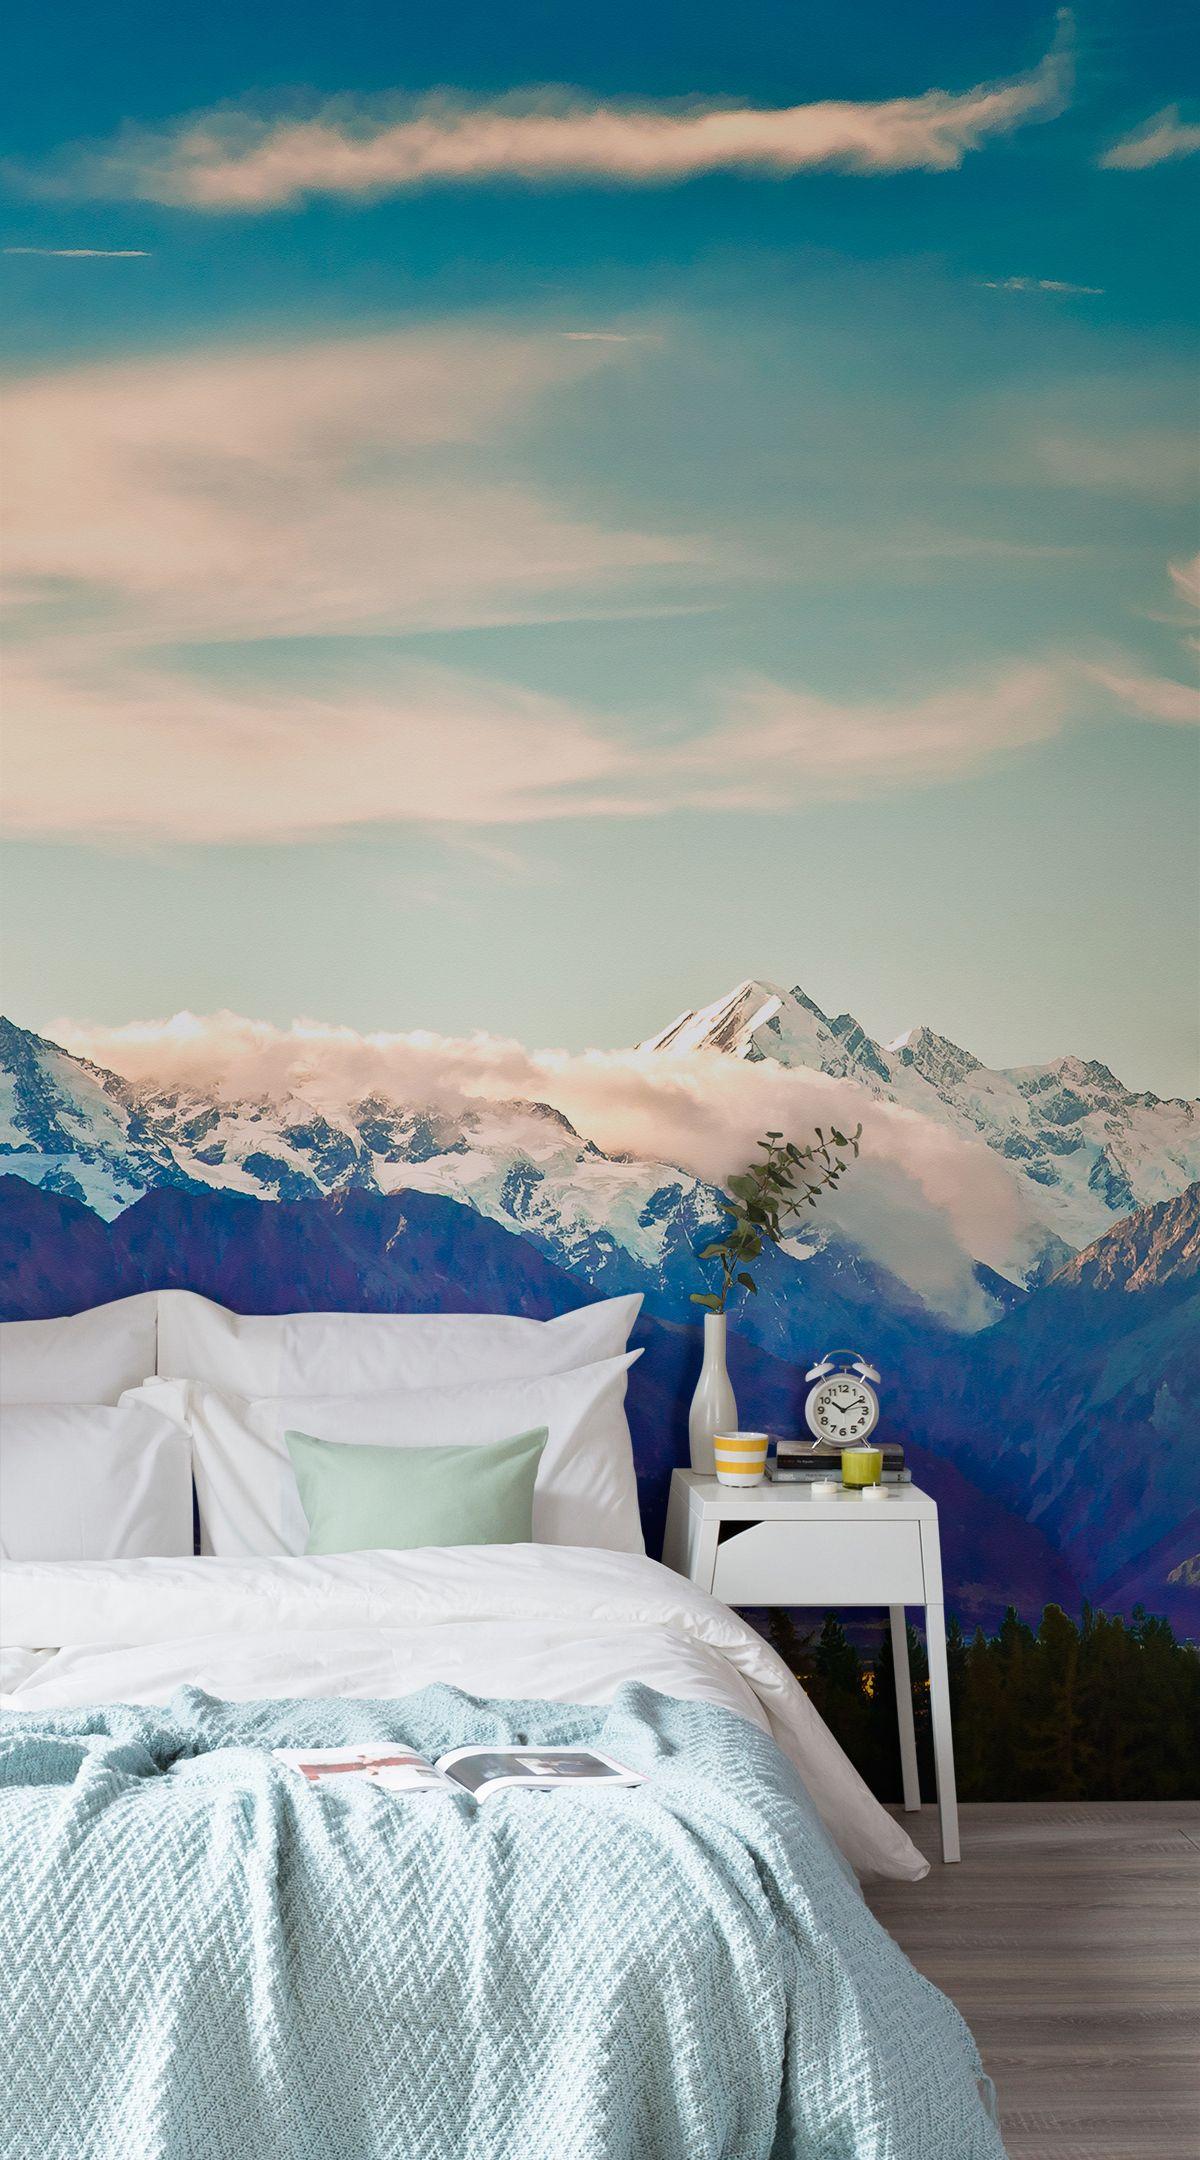 Everest Landscape Wallpaper Mural Tapety, Ložnice a